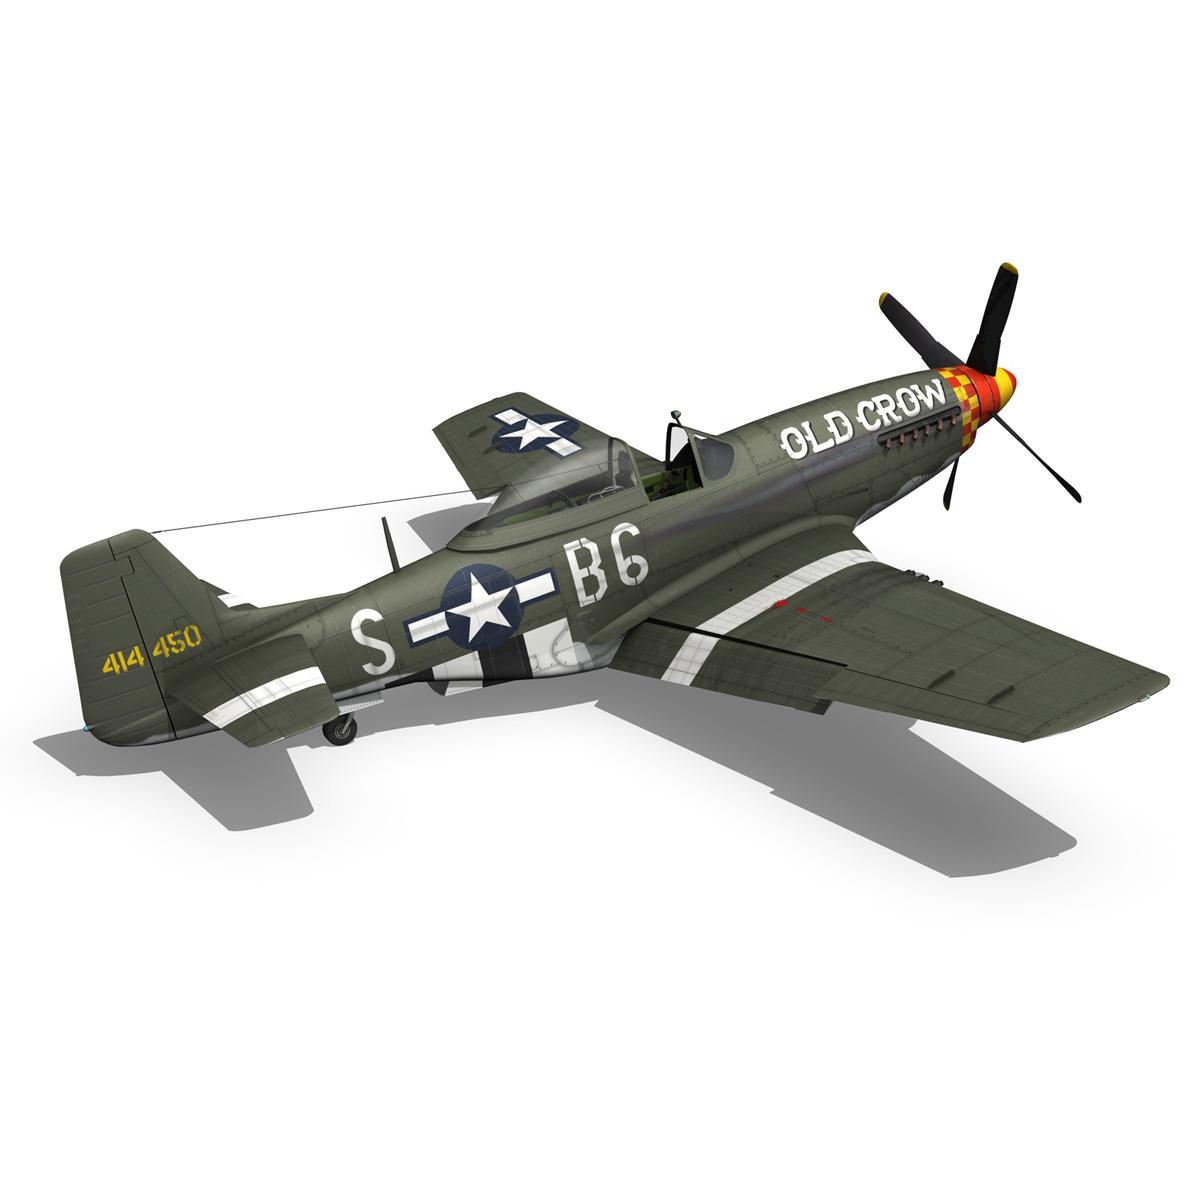 north american p-51d mustang – old crow 3d model fbx c4d lwo obj 273345